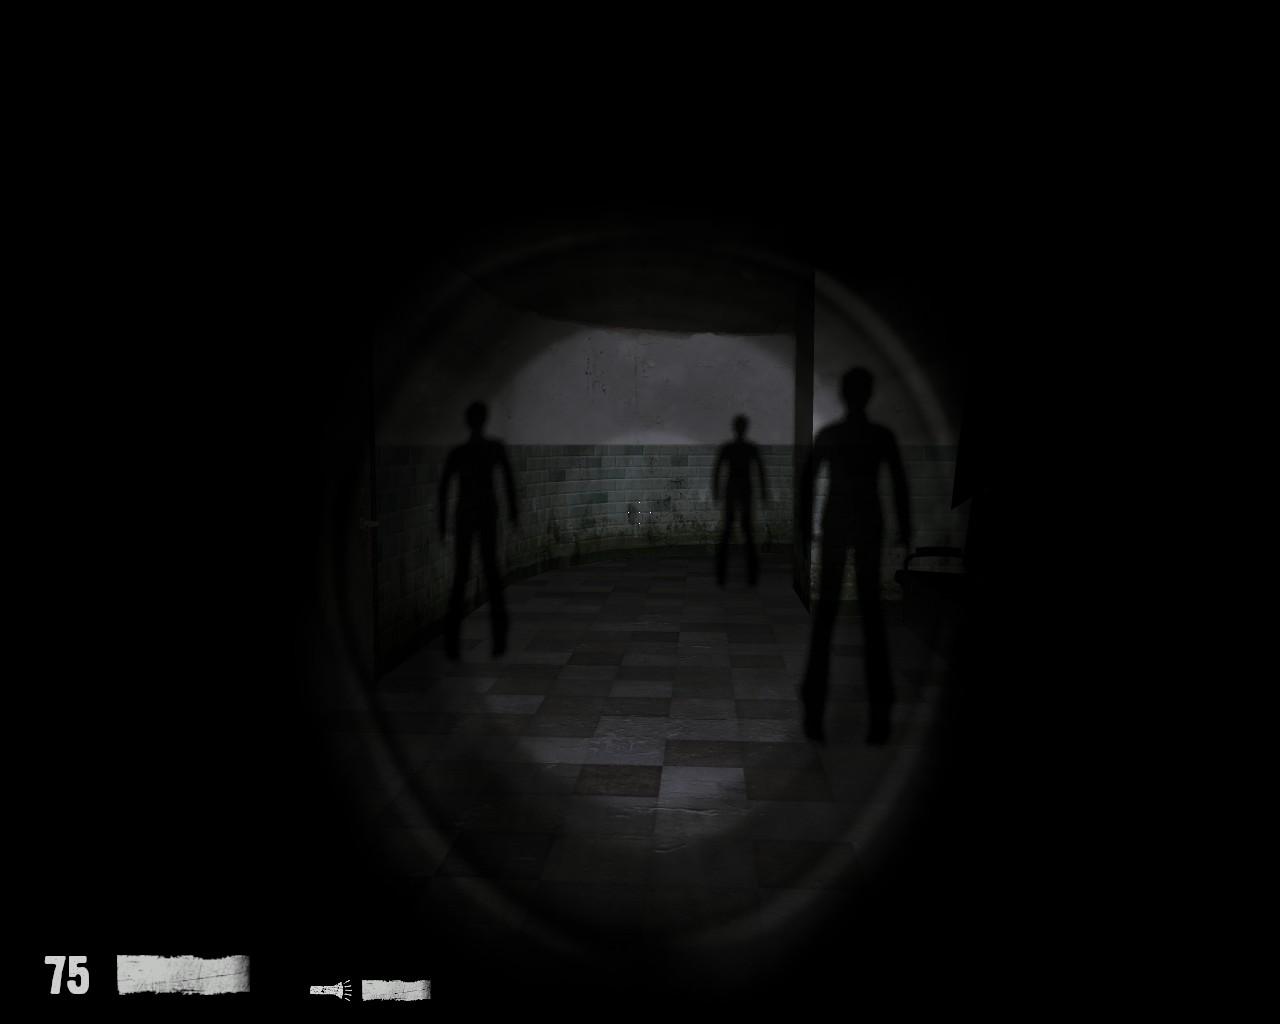 hl2 2015-02-05 22-42-23-07.jpg - Half-Life 2